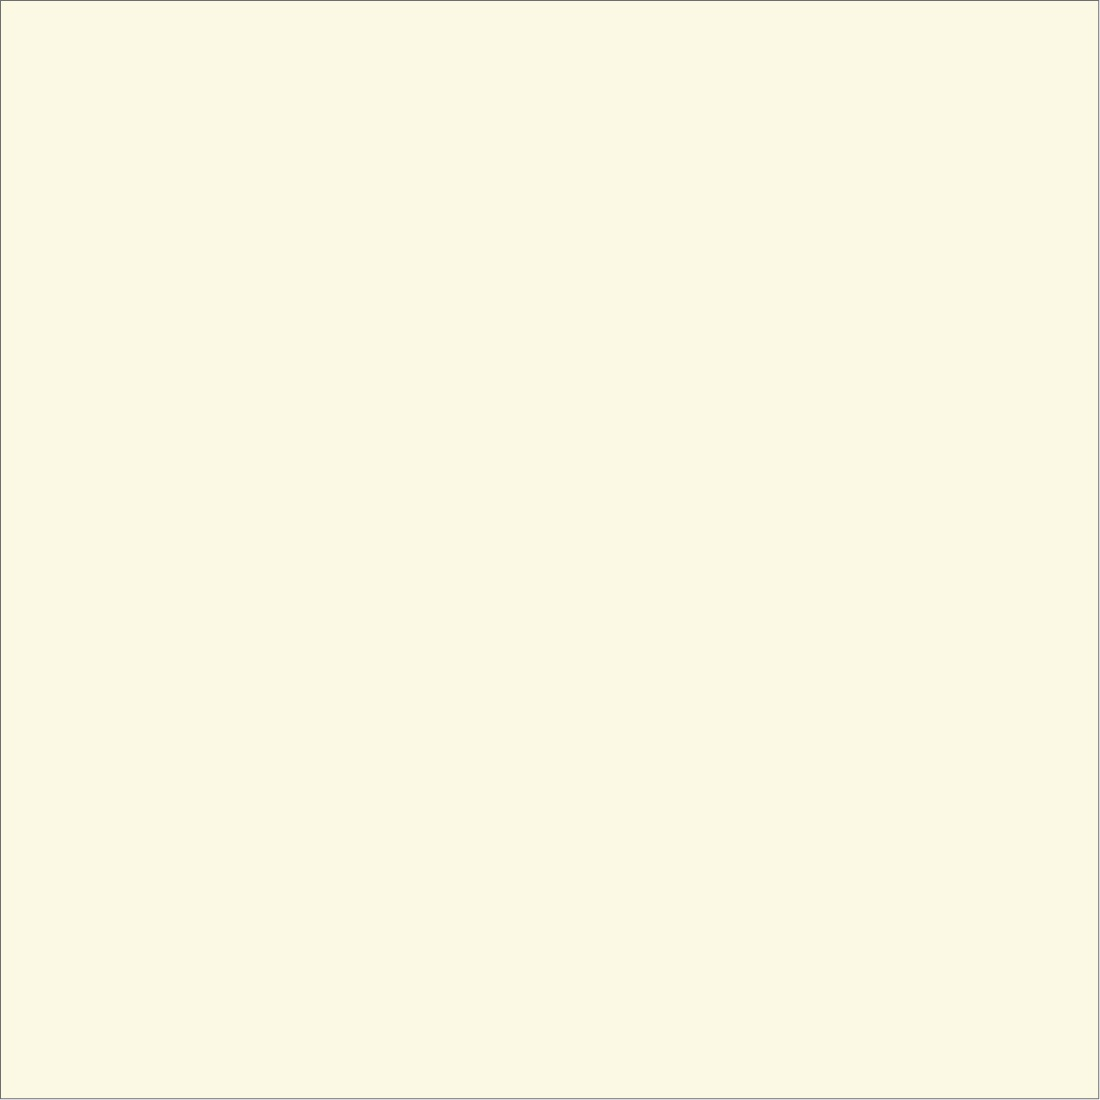 Trespa® Meteon® HPL Plaat EZ Wit A03.0.0 3650x1860x6mm